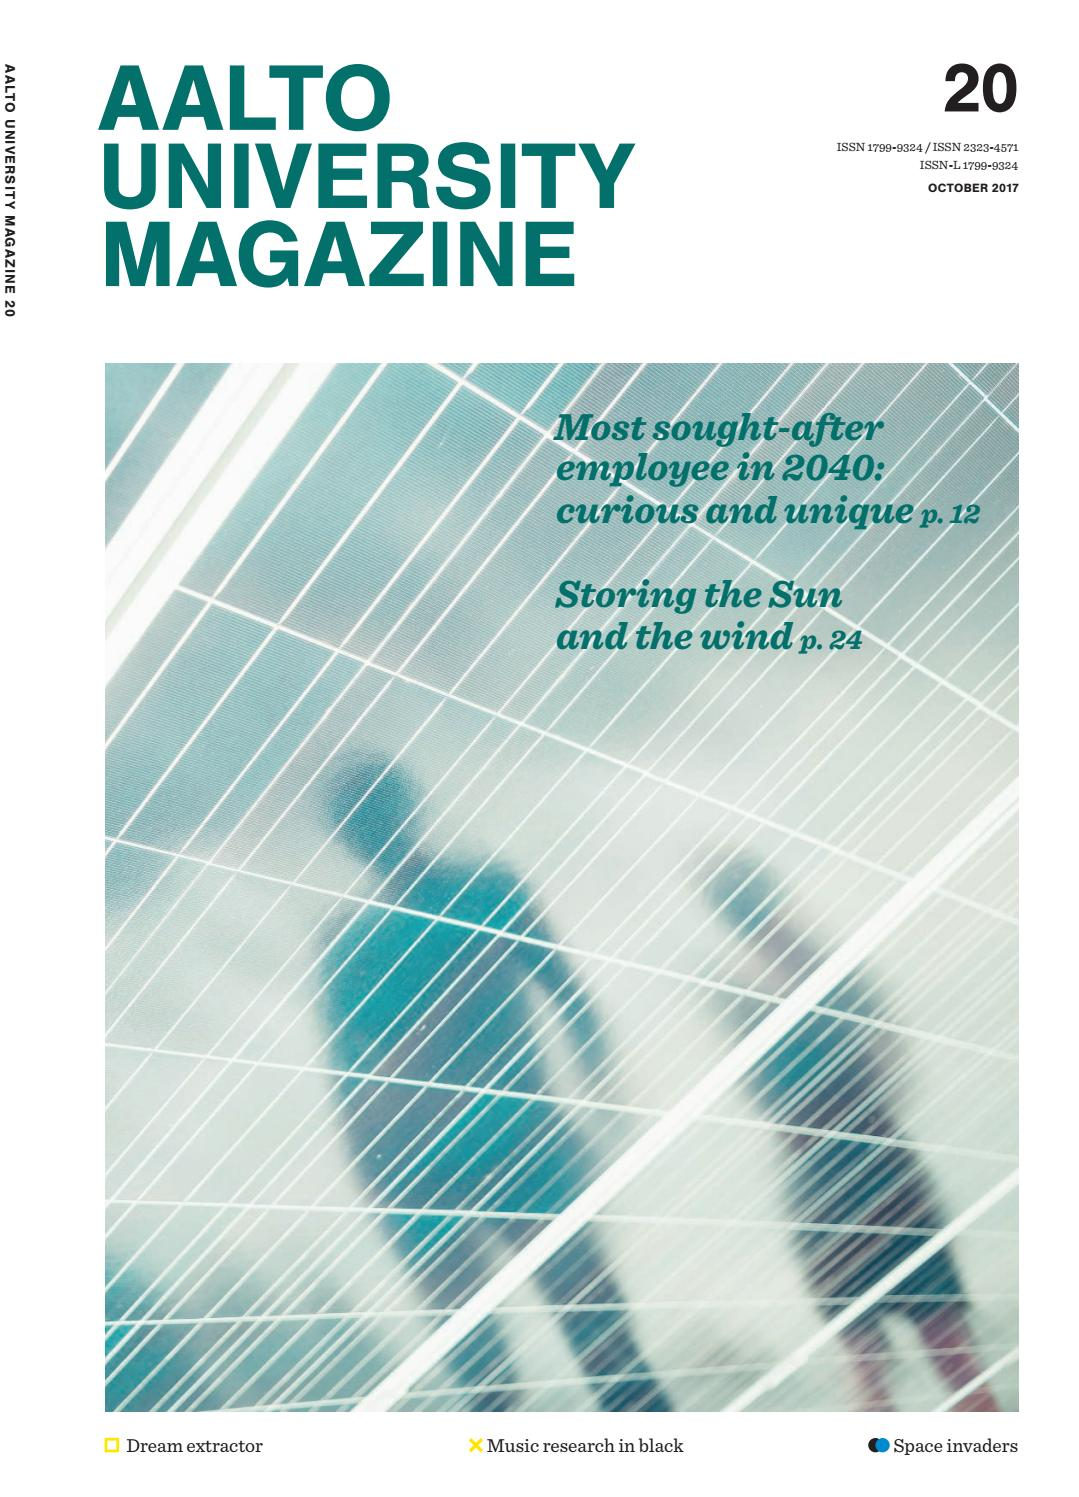 Aalto University Magazine 20 English Edition By Argentine Tango Steps Diagram Companion Ebook Issuu